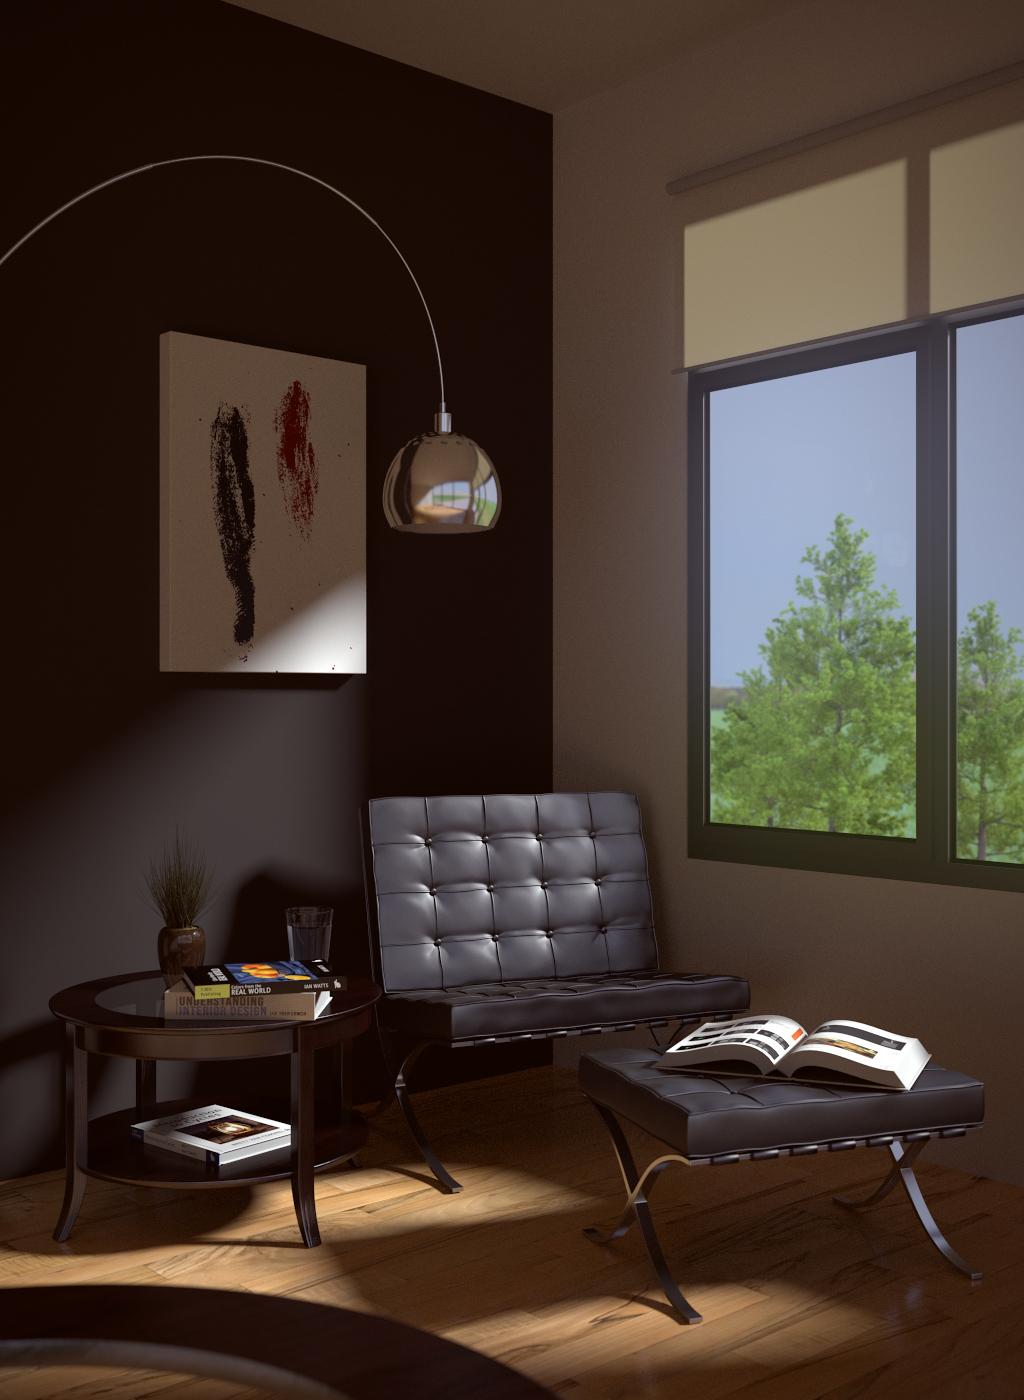 Basic Lounge Room